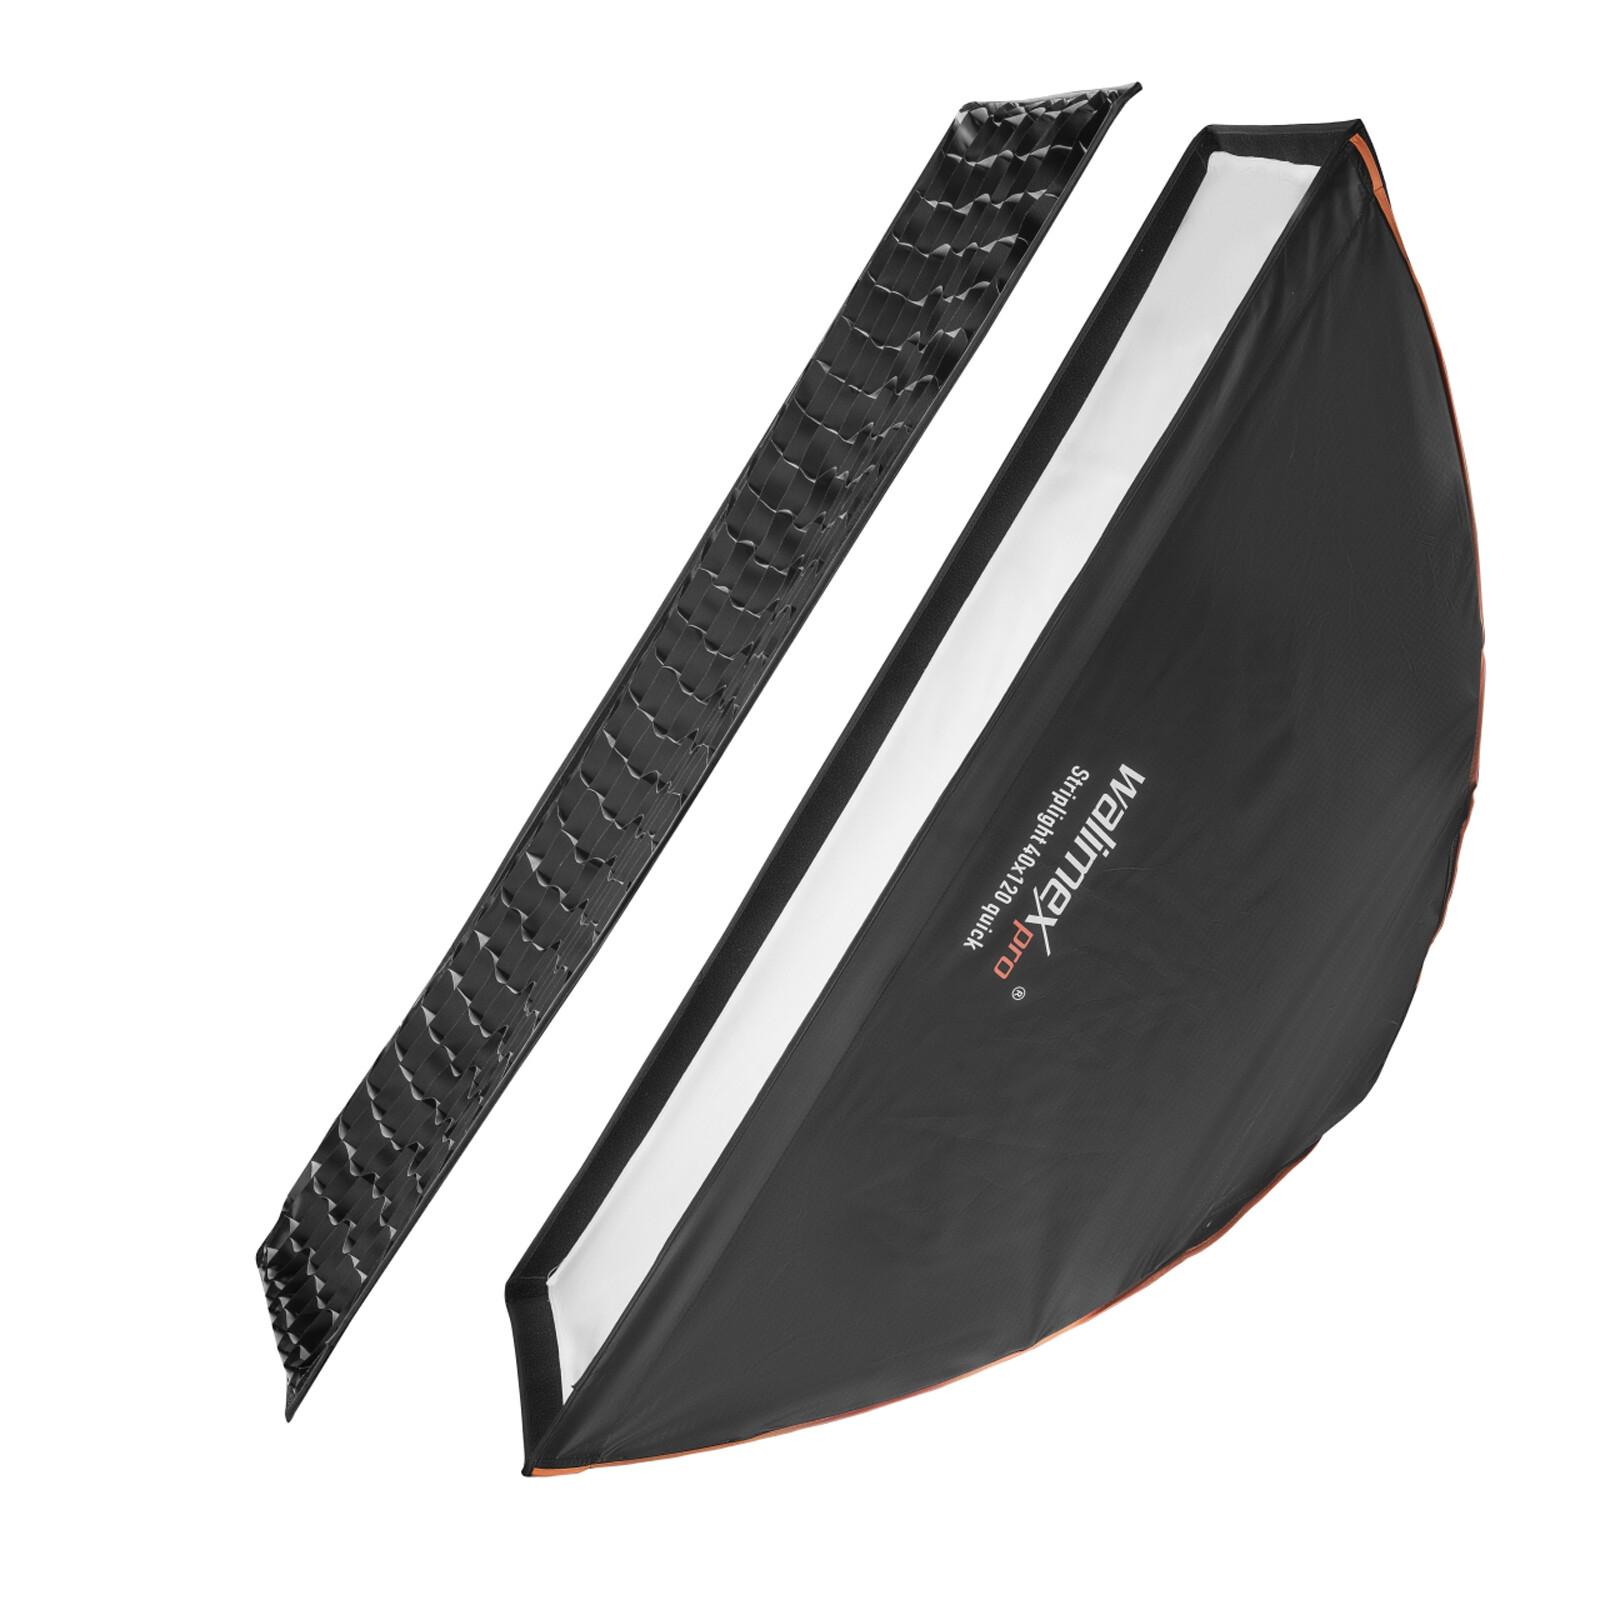 Walimex pro Studio Line Striplight Softbox QA 40x120cm Visat